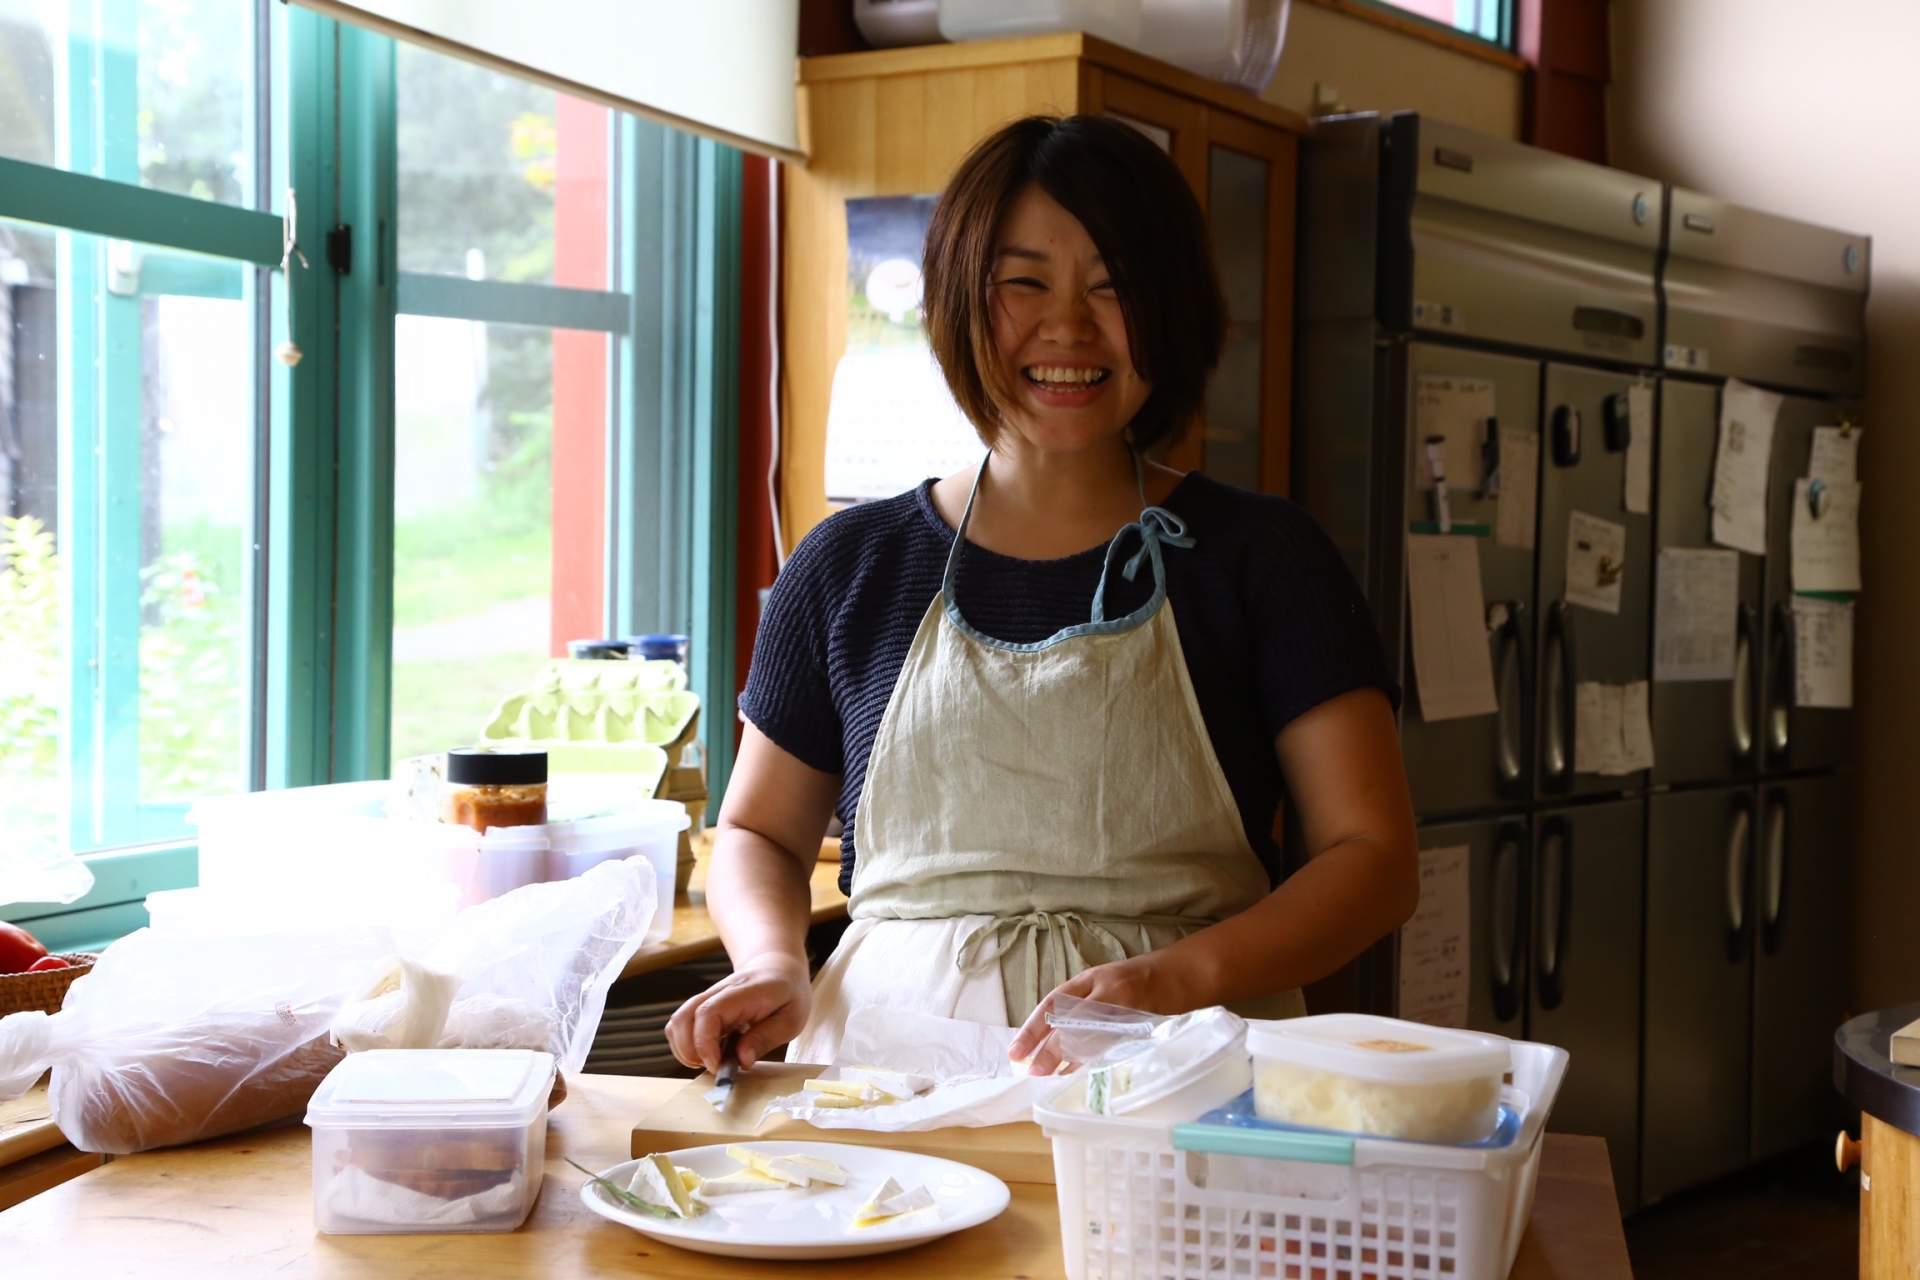 Kyodo-Gakusha Cheese - アペロ ワインバー / apéro WINEBAR - vins et petits plats français - Minami Aoyama Tokyo